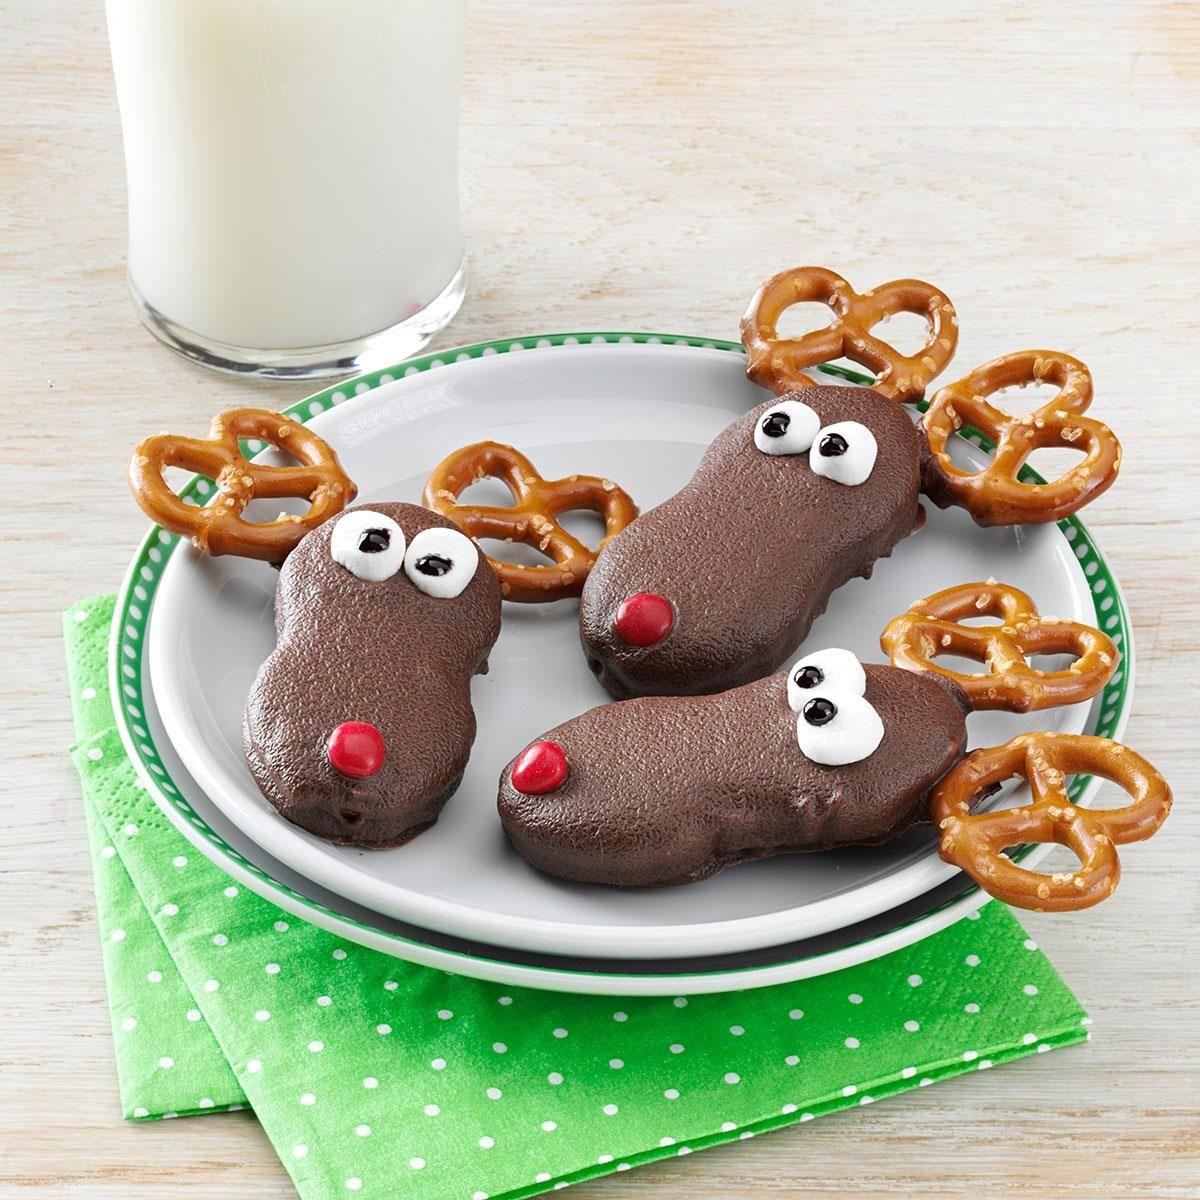 Holiday reindeer cookies recipe pinterest reindeer cookies holiday reindeer cookies recipe pinterest reindeer cookies test kitchen and christmas eve forumfinder Gallery